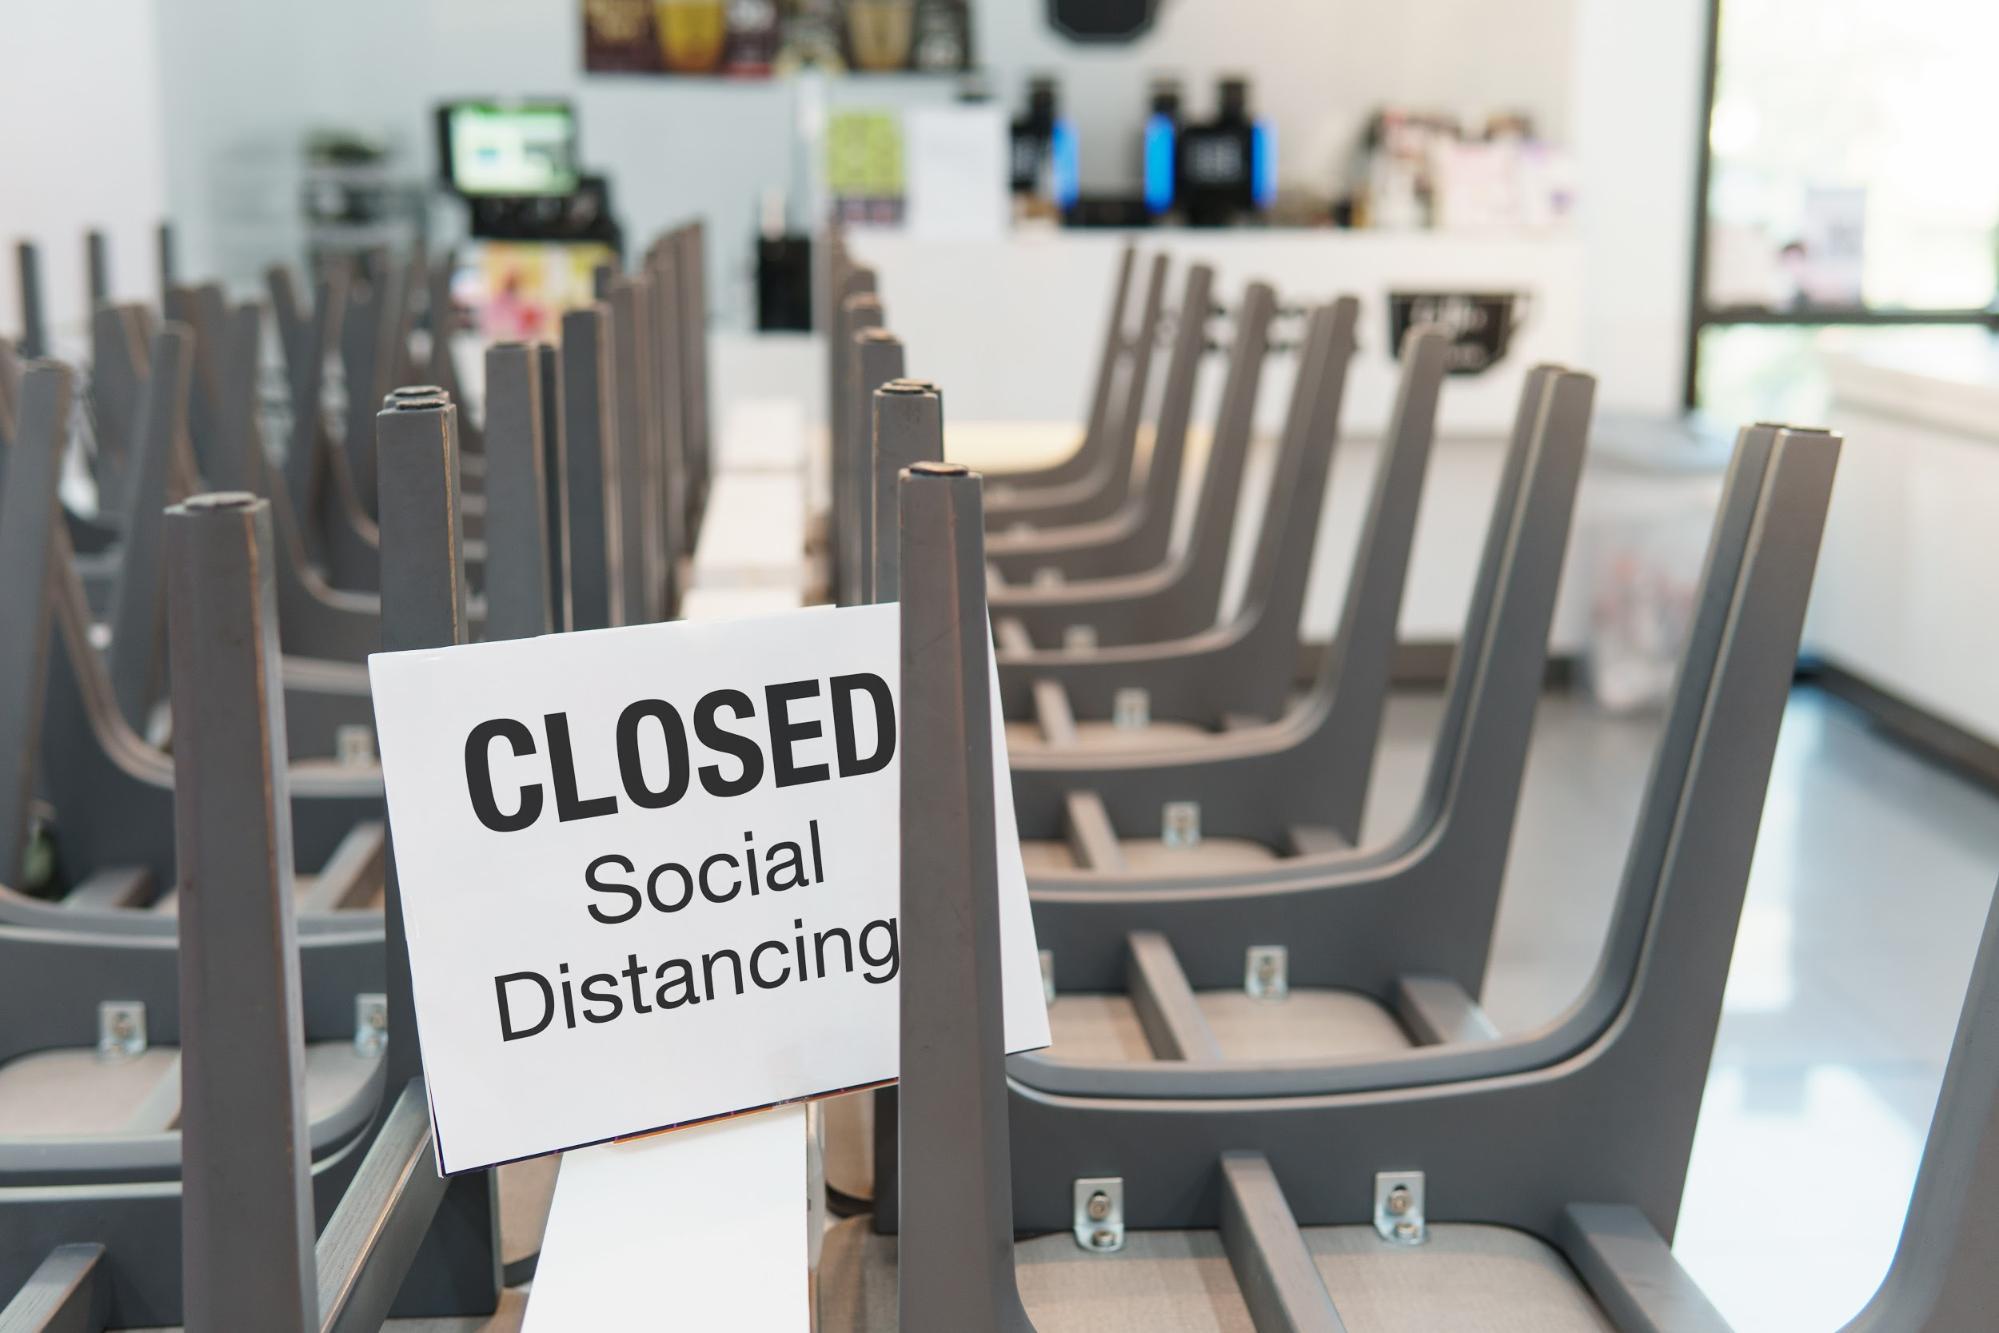 Sitting area closure_Covid-19_Aislelabs